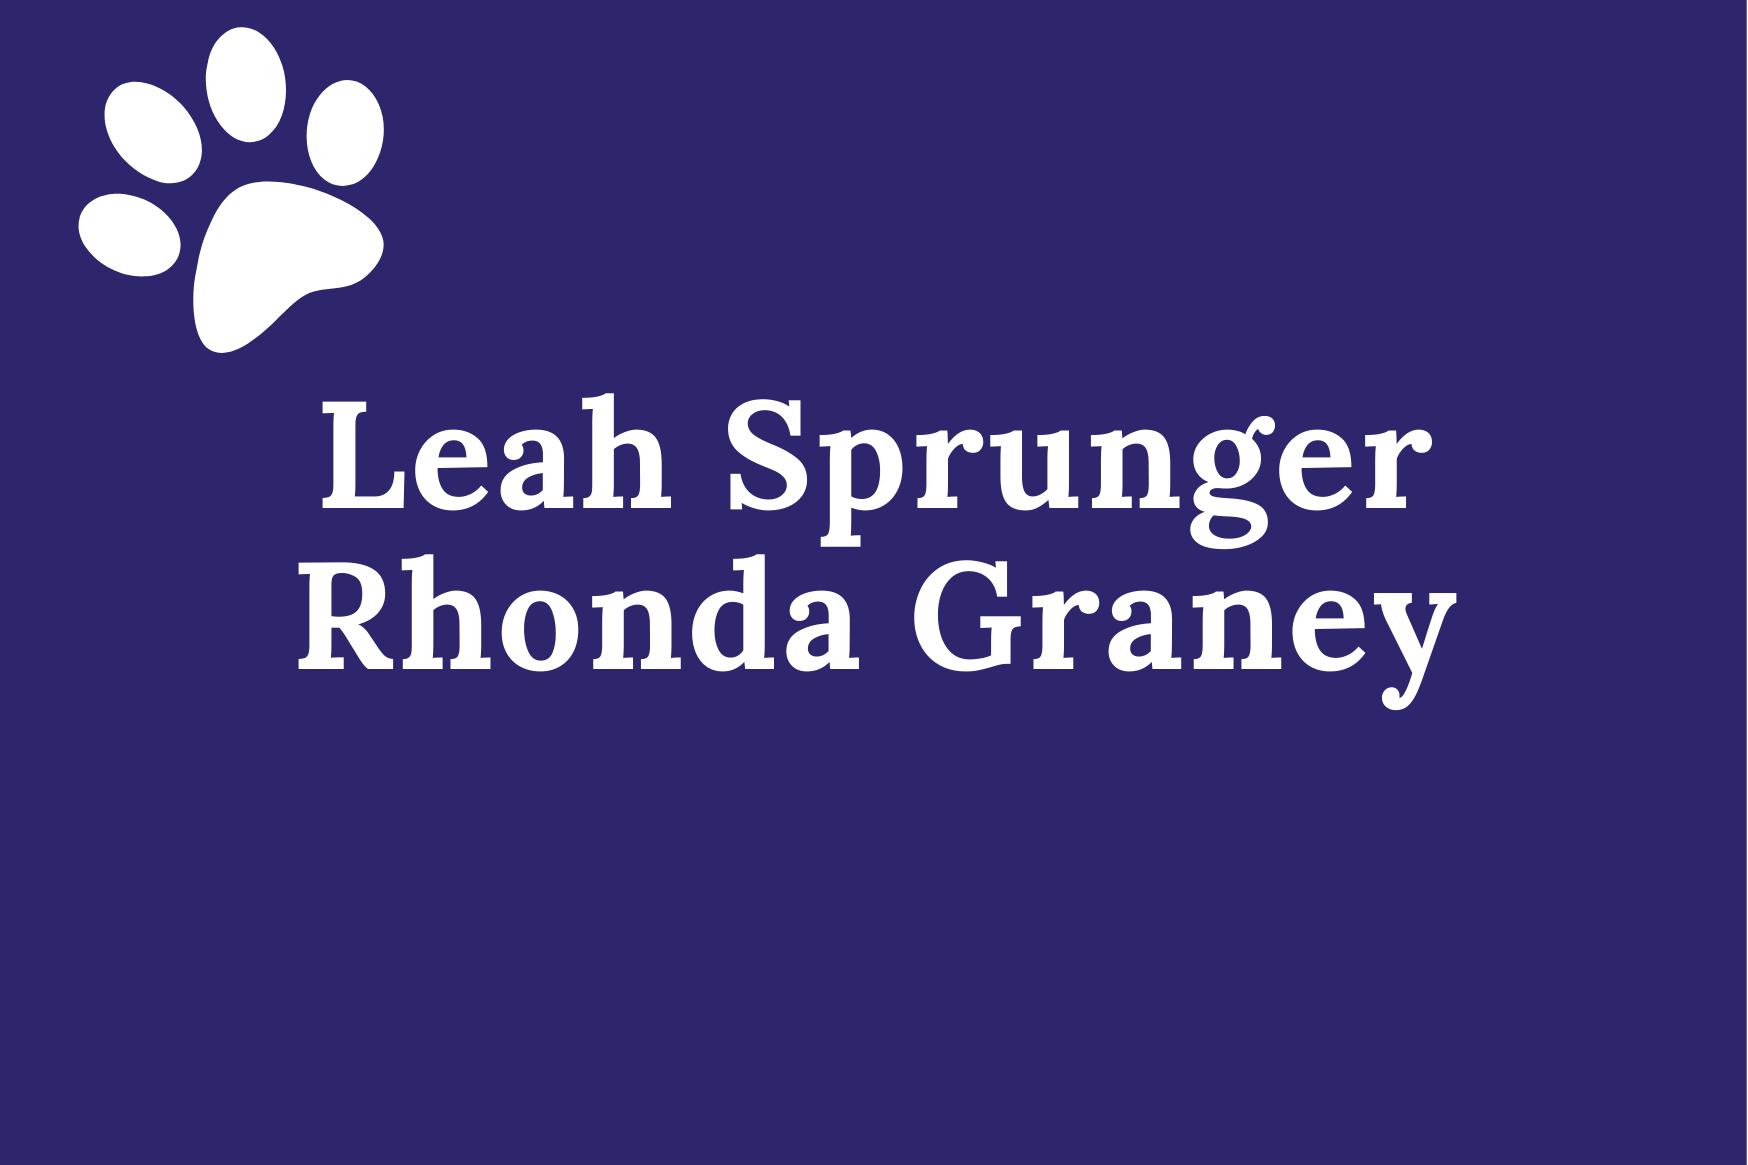 leah sprunger rhonda  graney